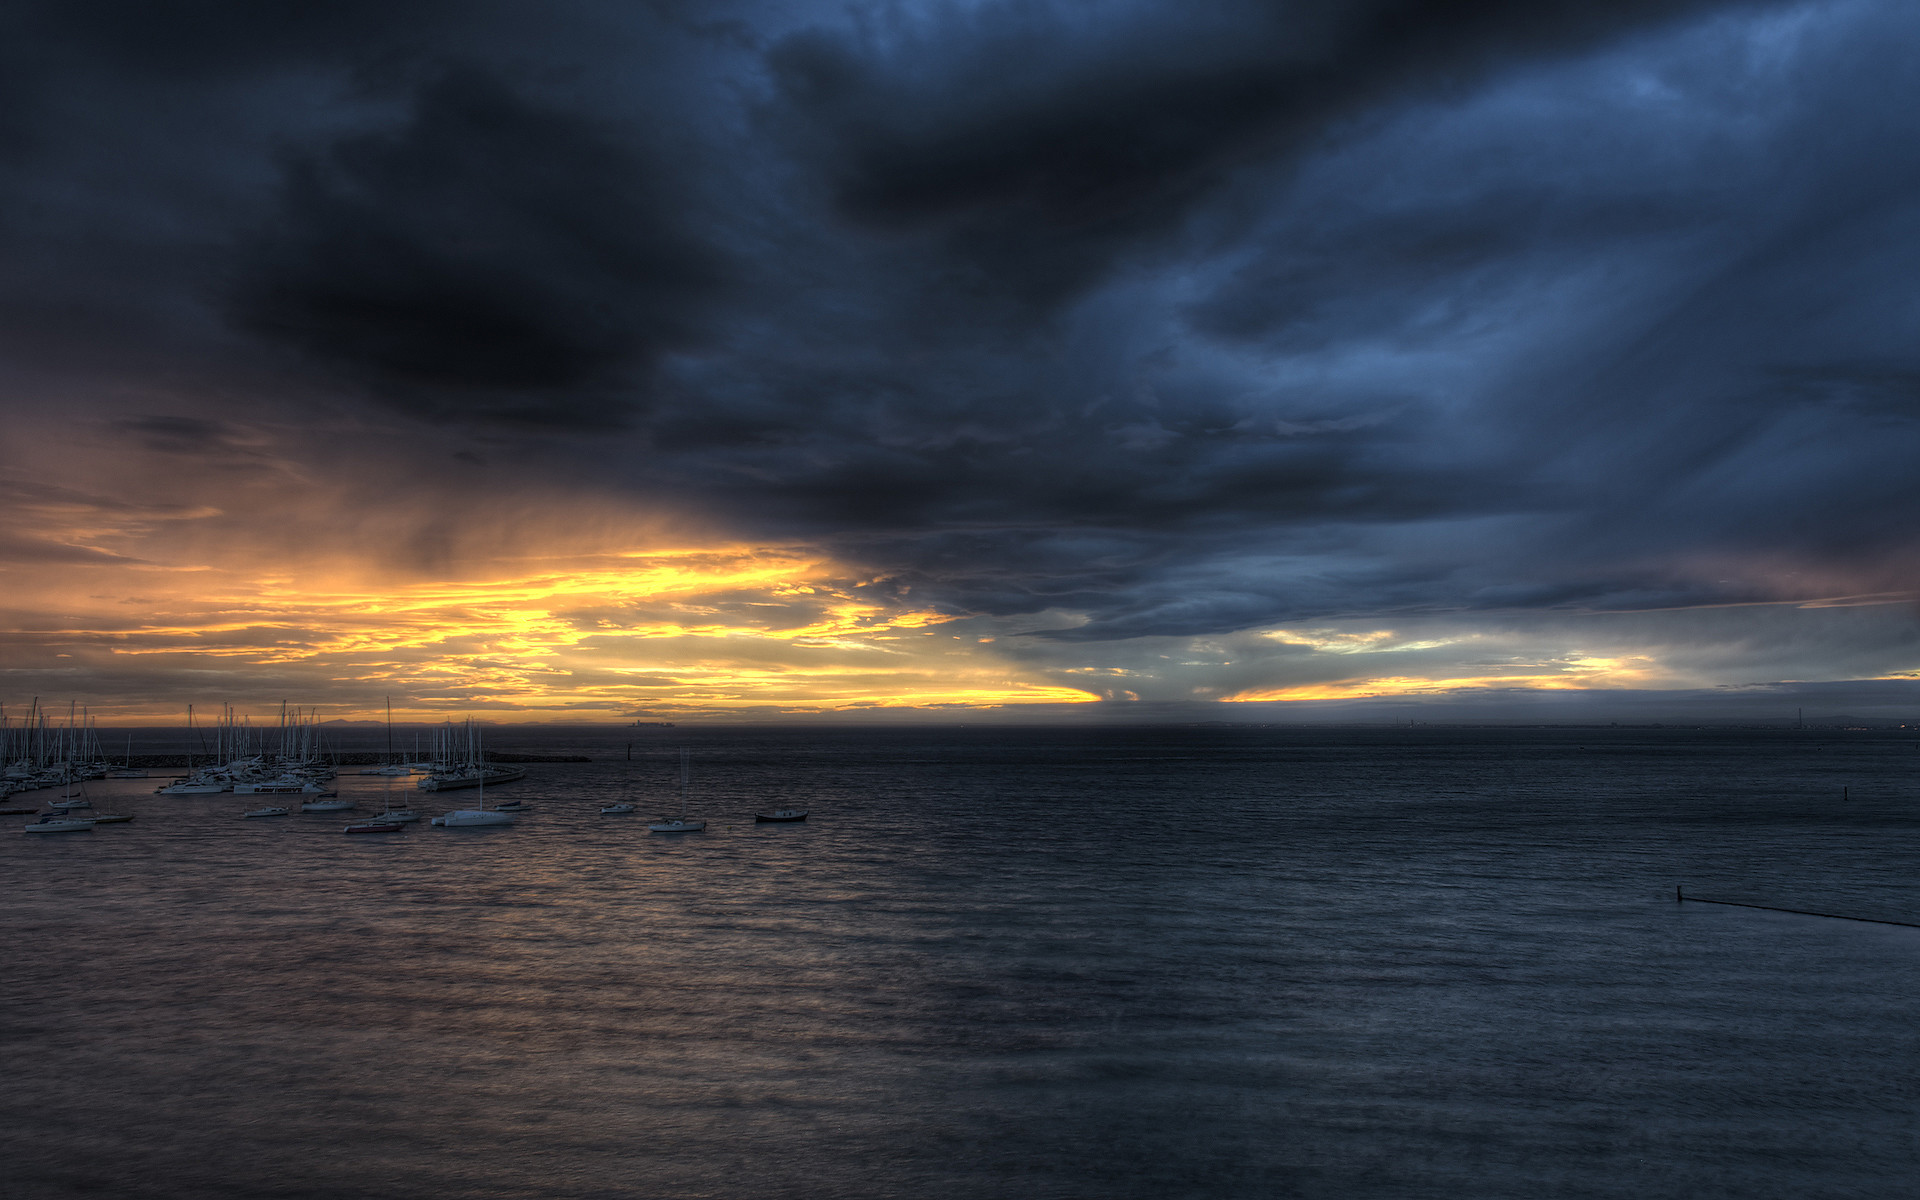 Storm Clouds Desktop Wallpaper 10380